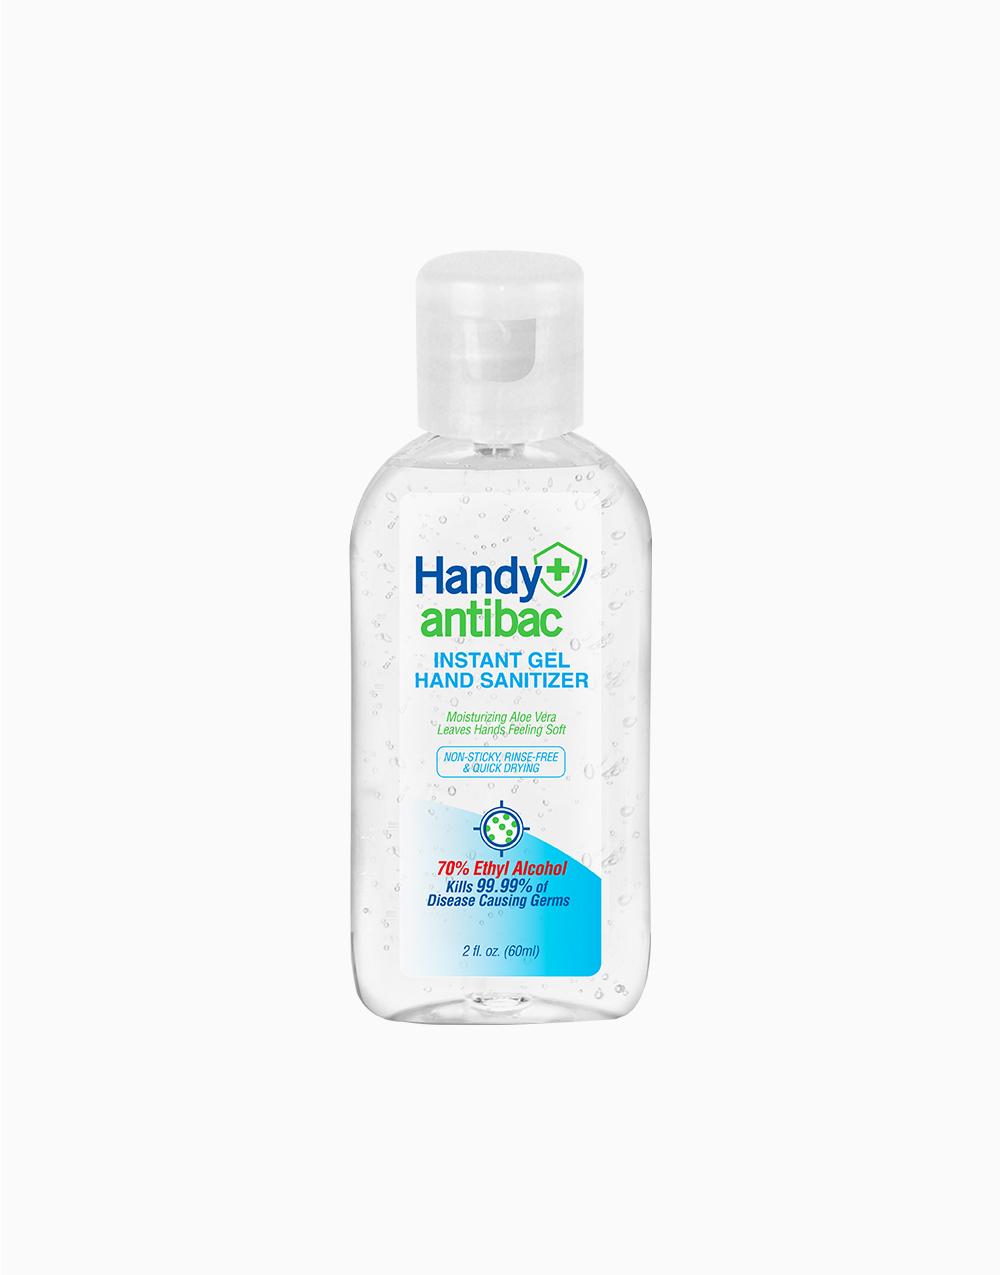 Handy Antibac Instant Gel Hand Sanitizer (60ml) by Handy Antibac